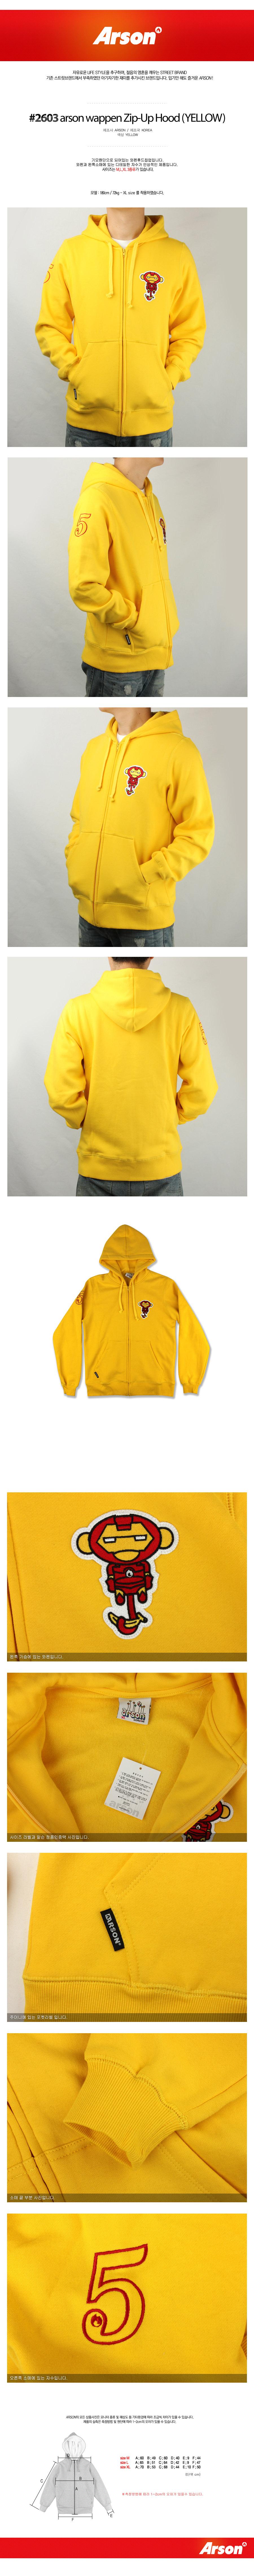 [ ARSON ] [ARSON] J2603 arson HOOD TEE zip up hoodie